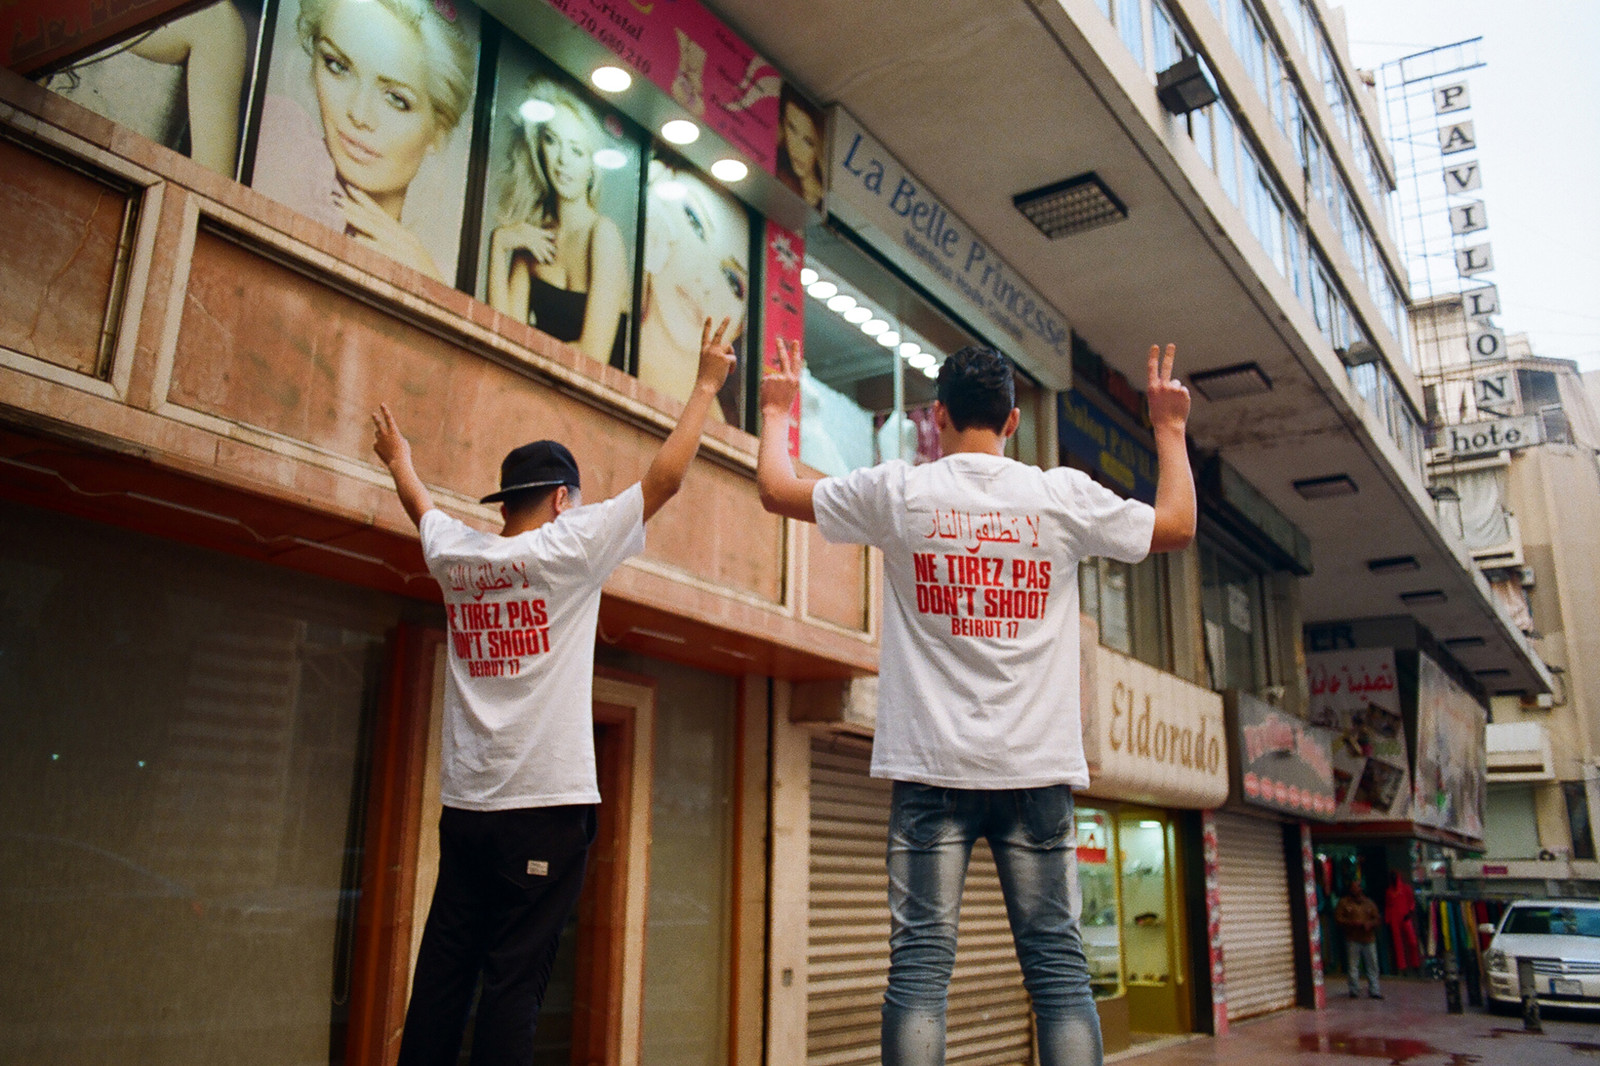 Beirut Youth Exhibit adidas Originals Art Fashion Streetwear Charity